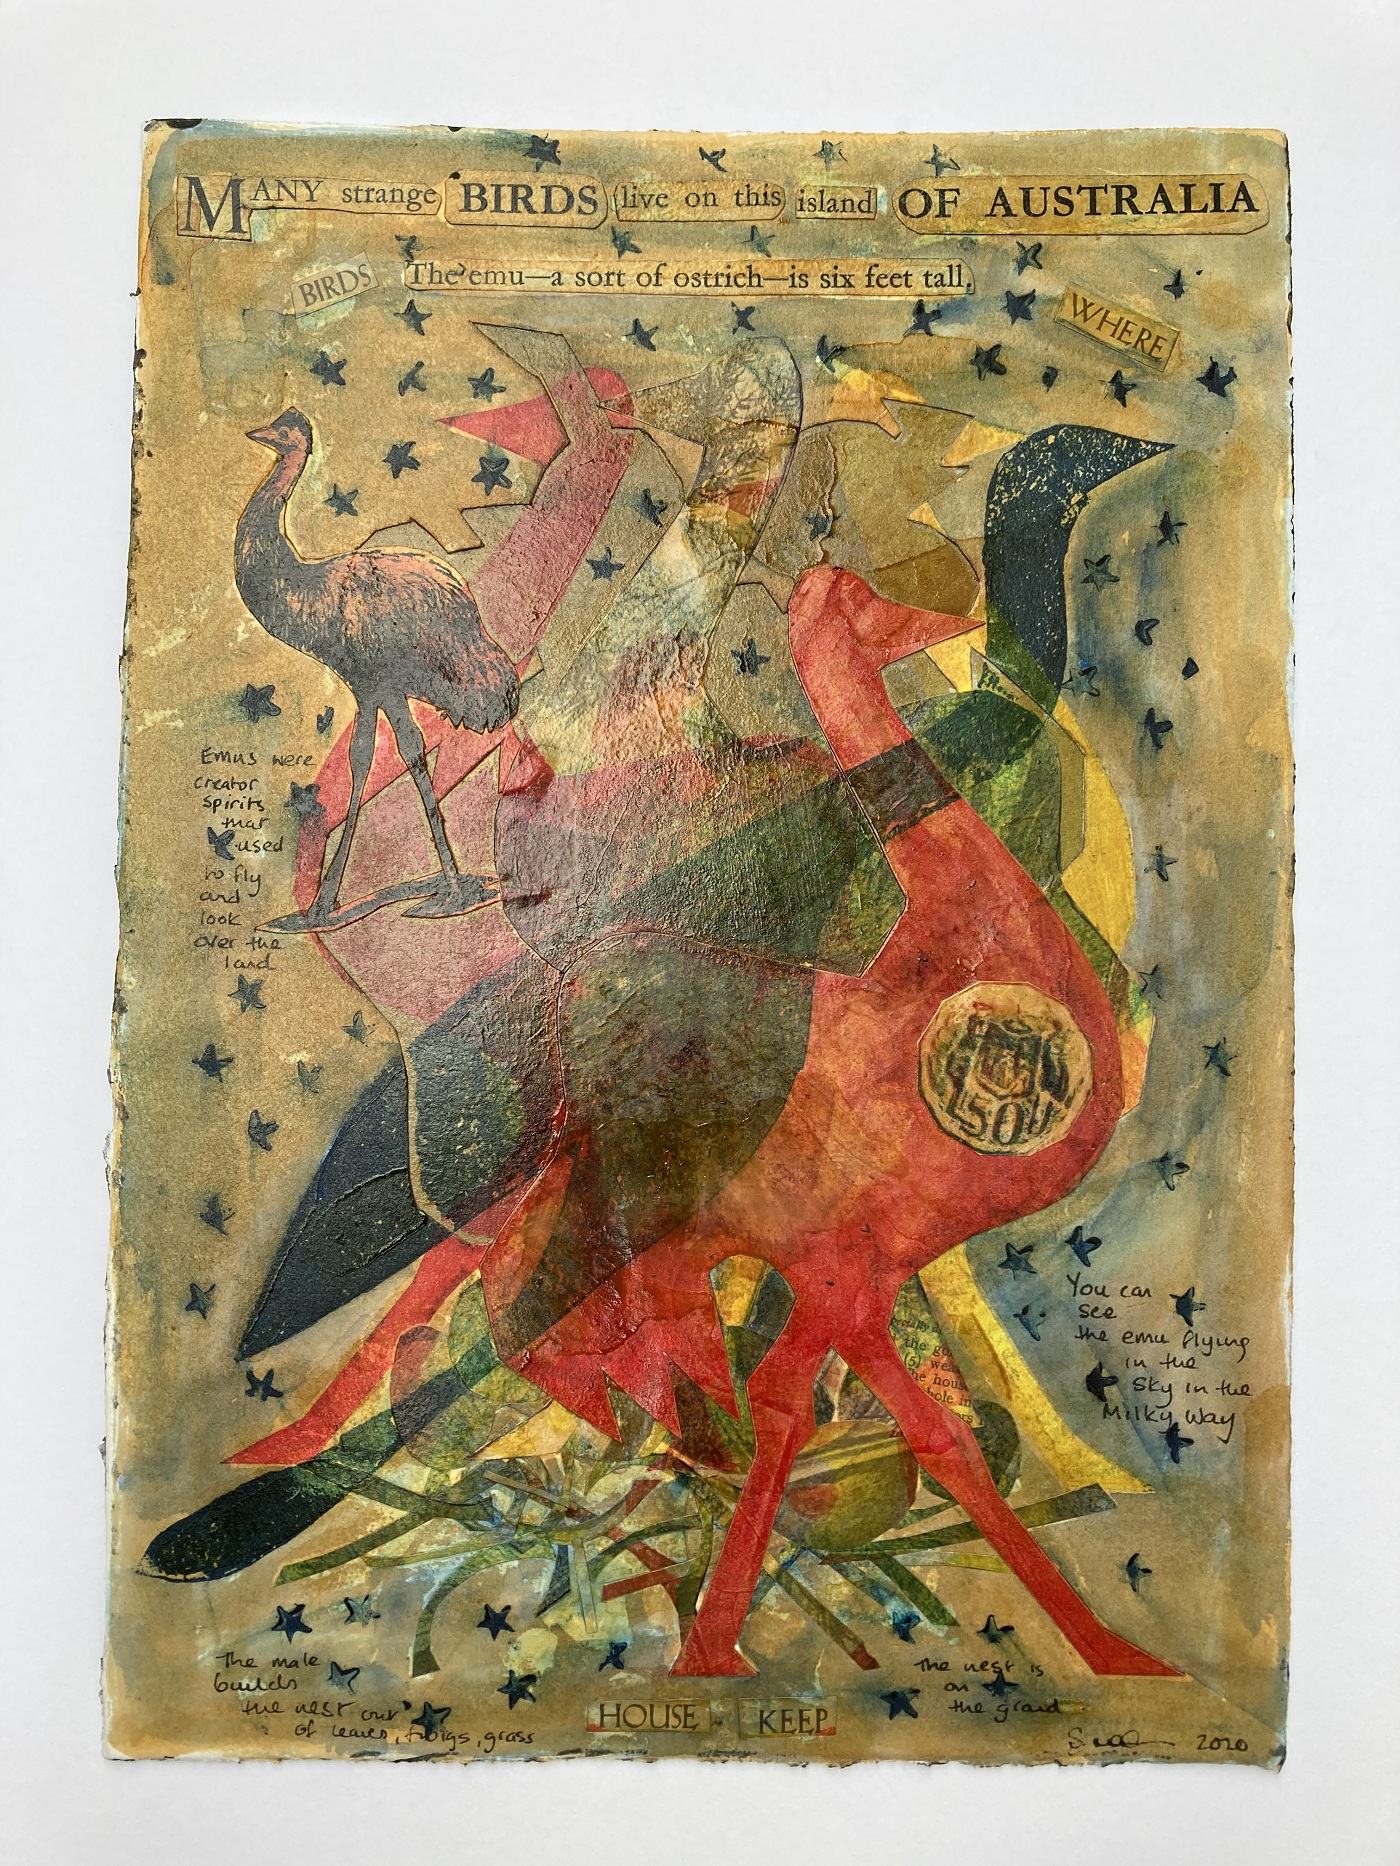 (196) Sheena Mathieson - House Keeping the Emu Image